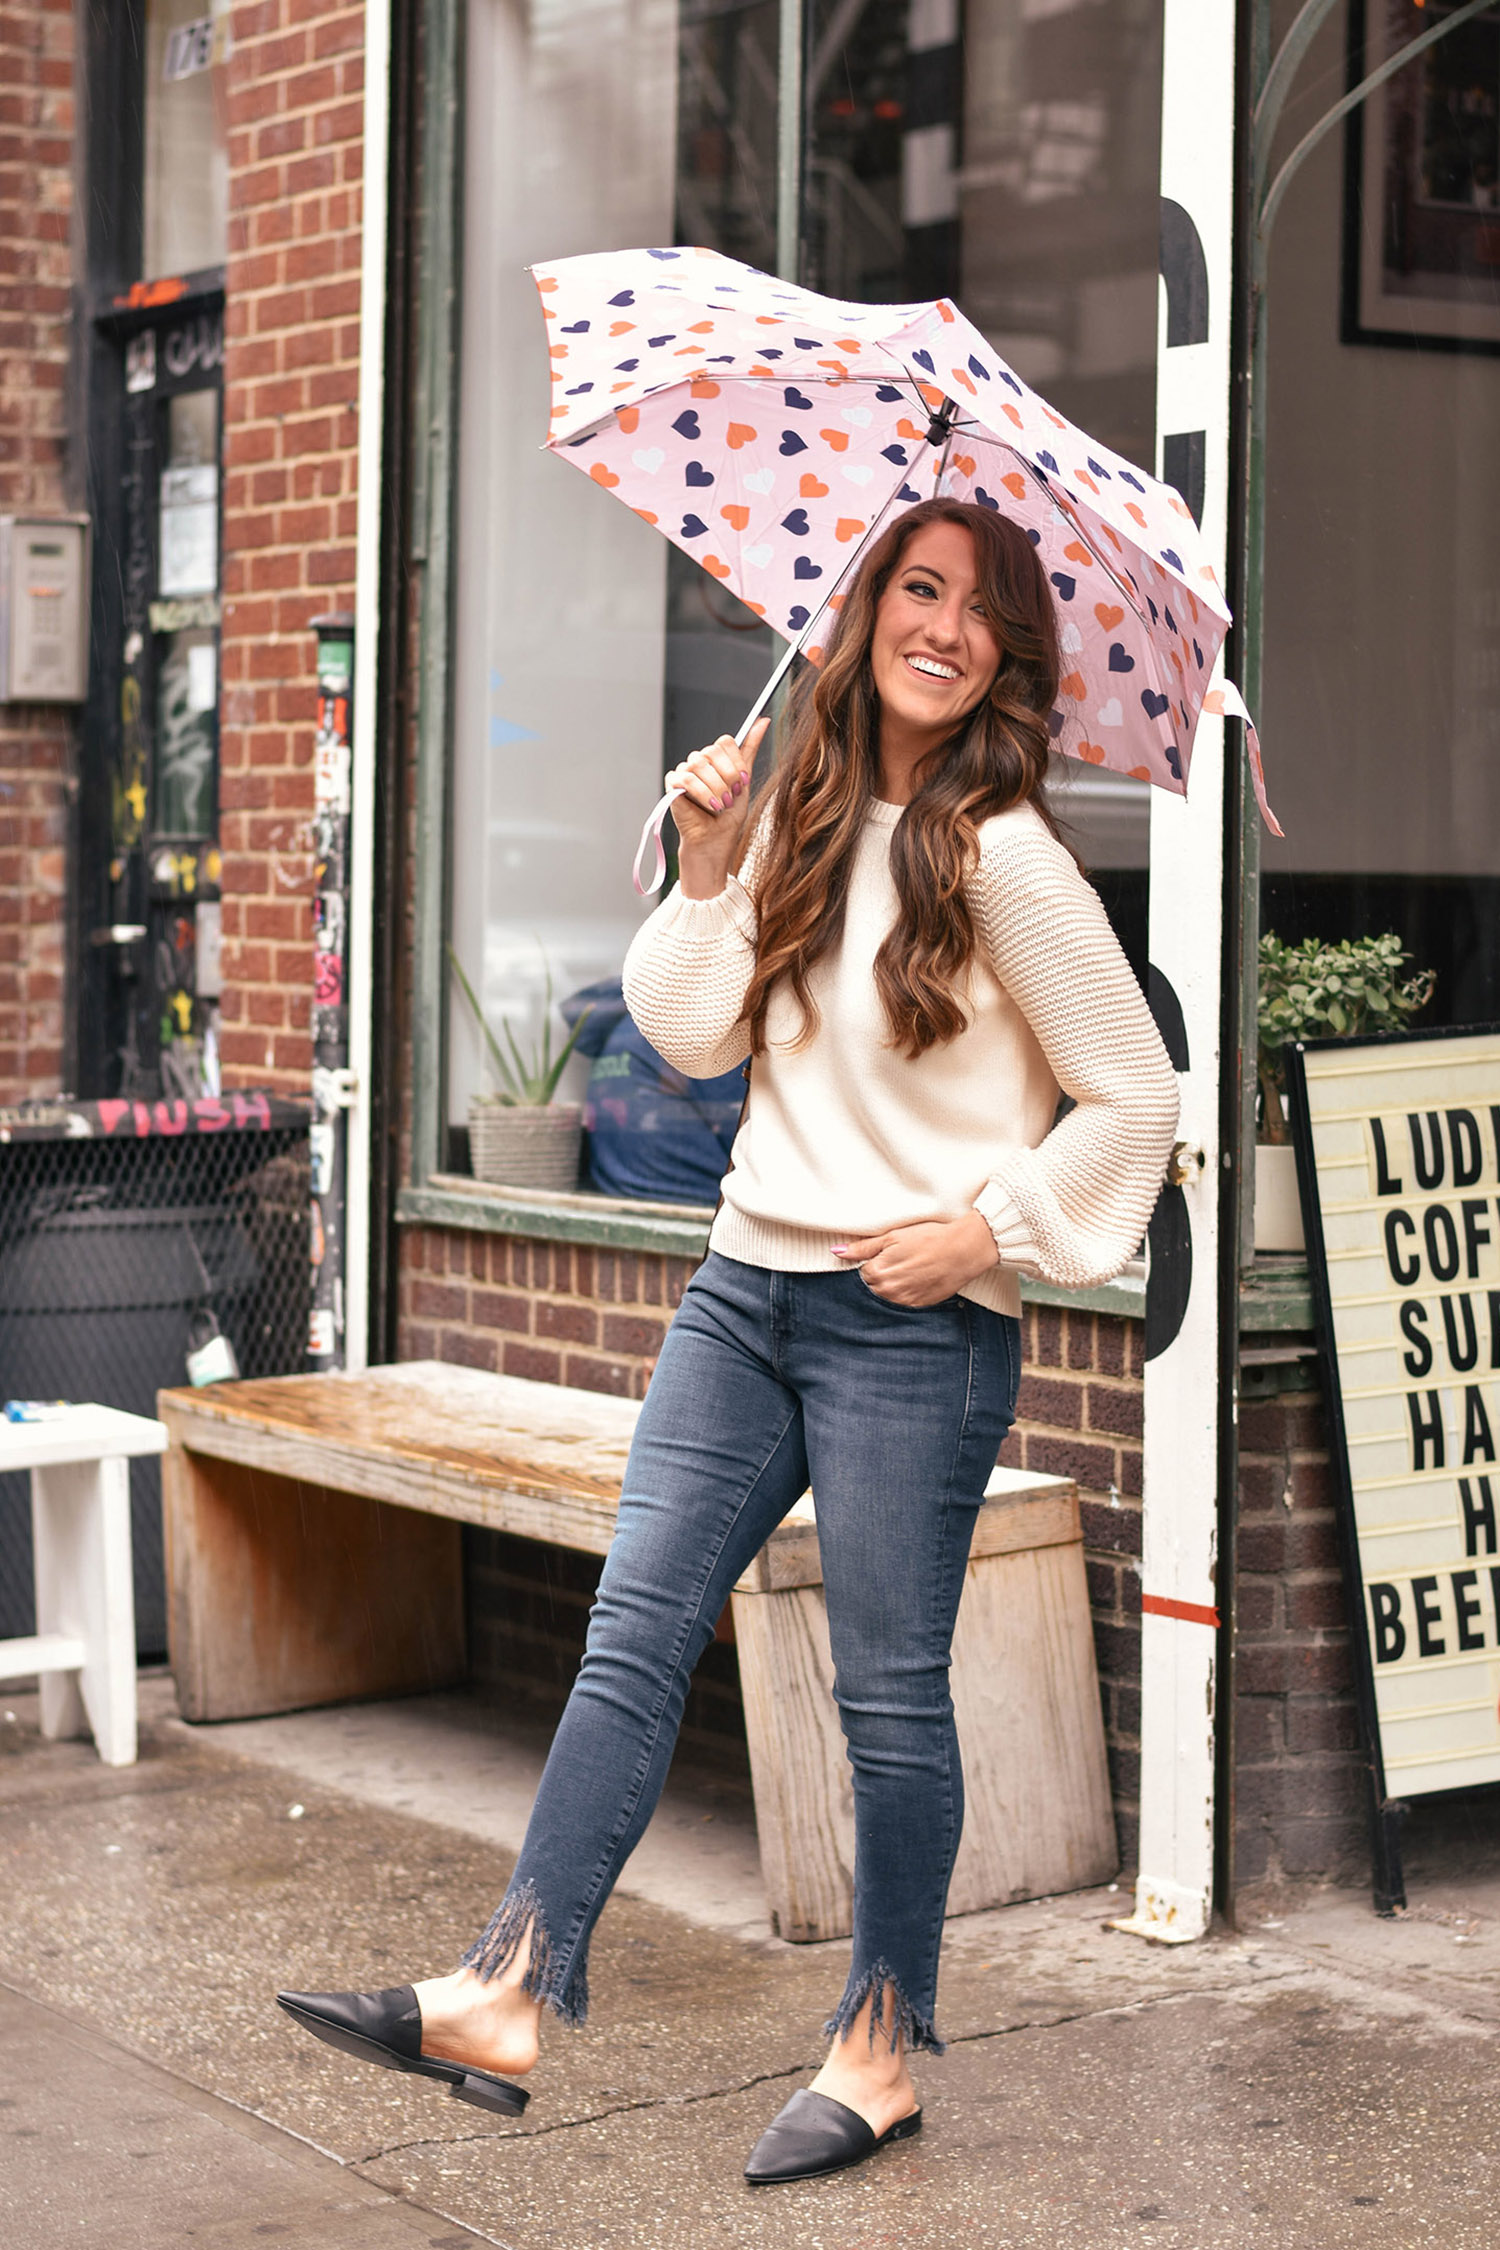 Lily & Sparrow Boutique sweater  //  denim  // Target mules [ similar  /  heeled version  /  loafer version ] //  umbrella